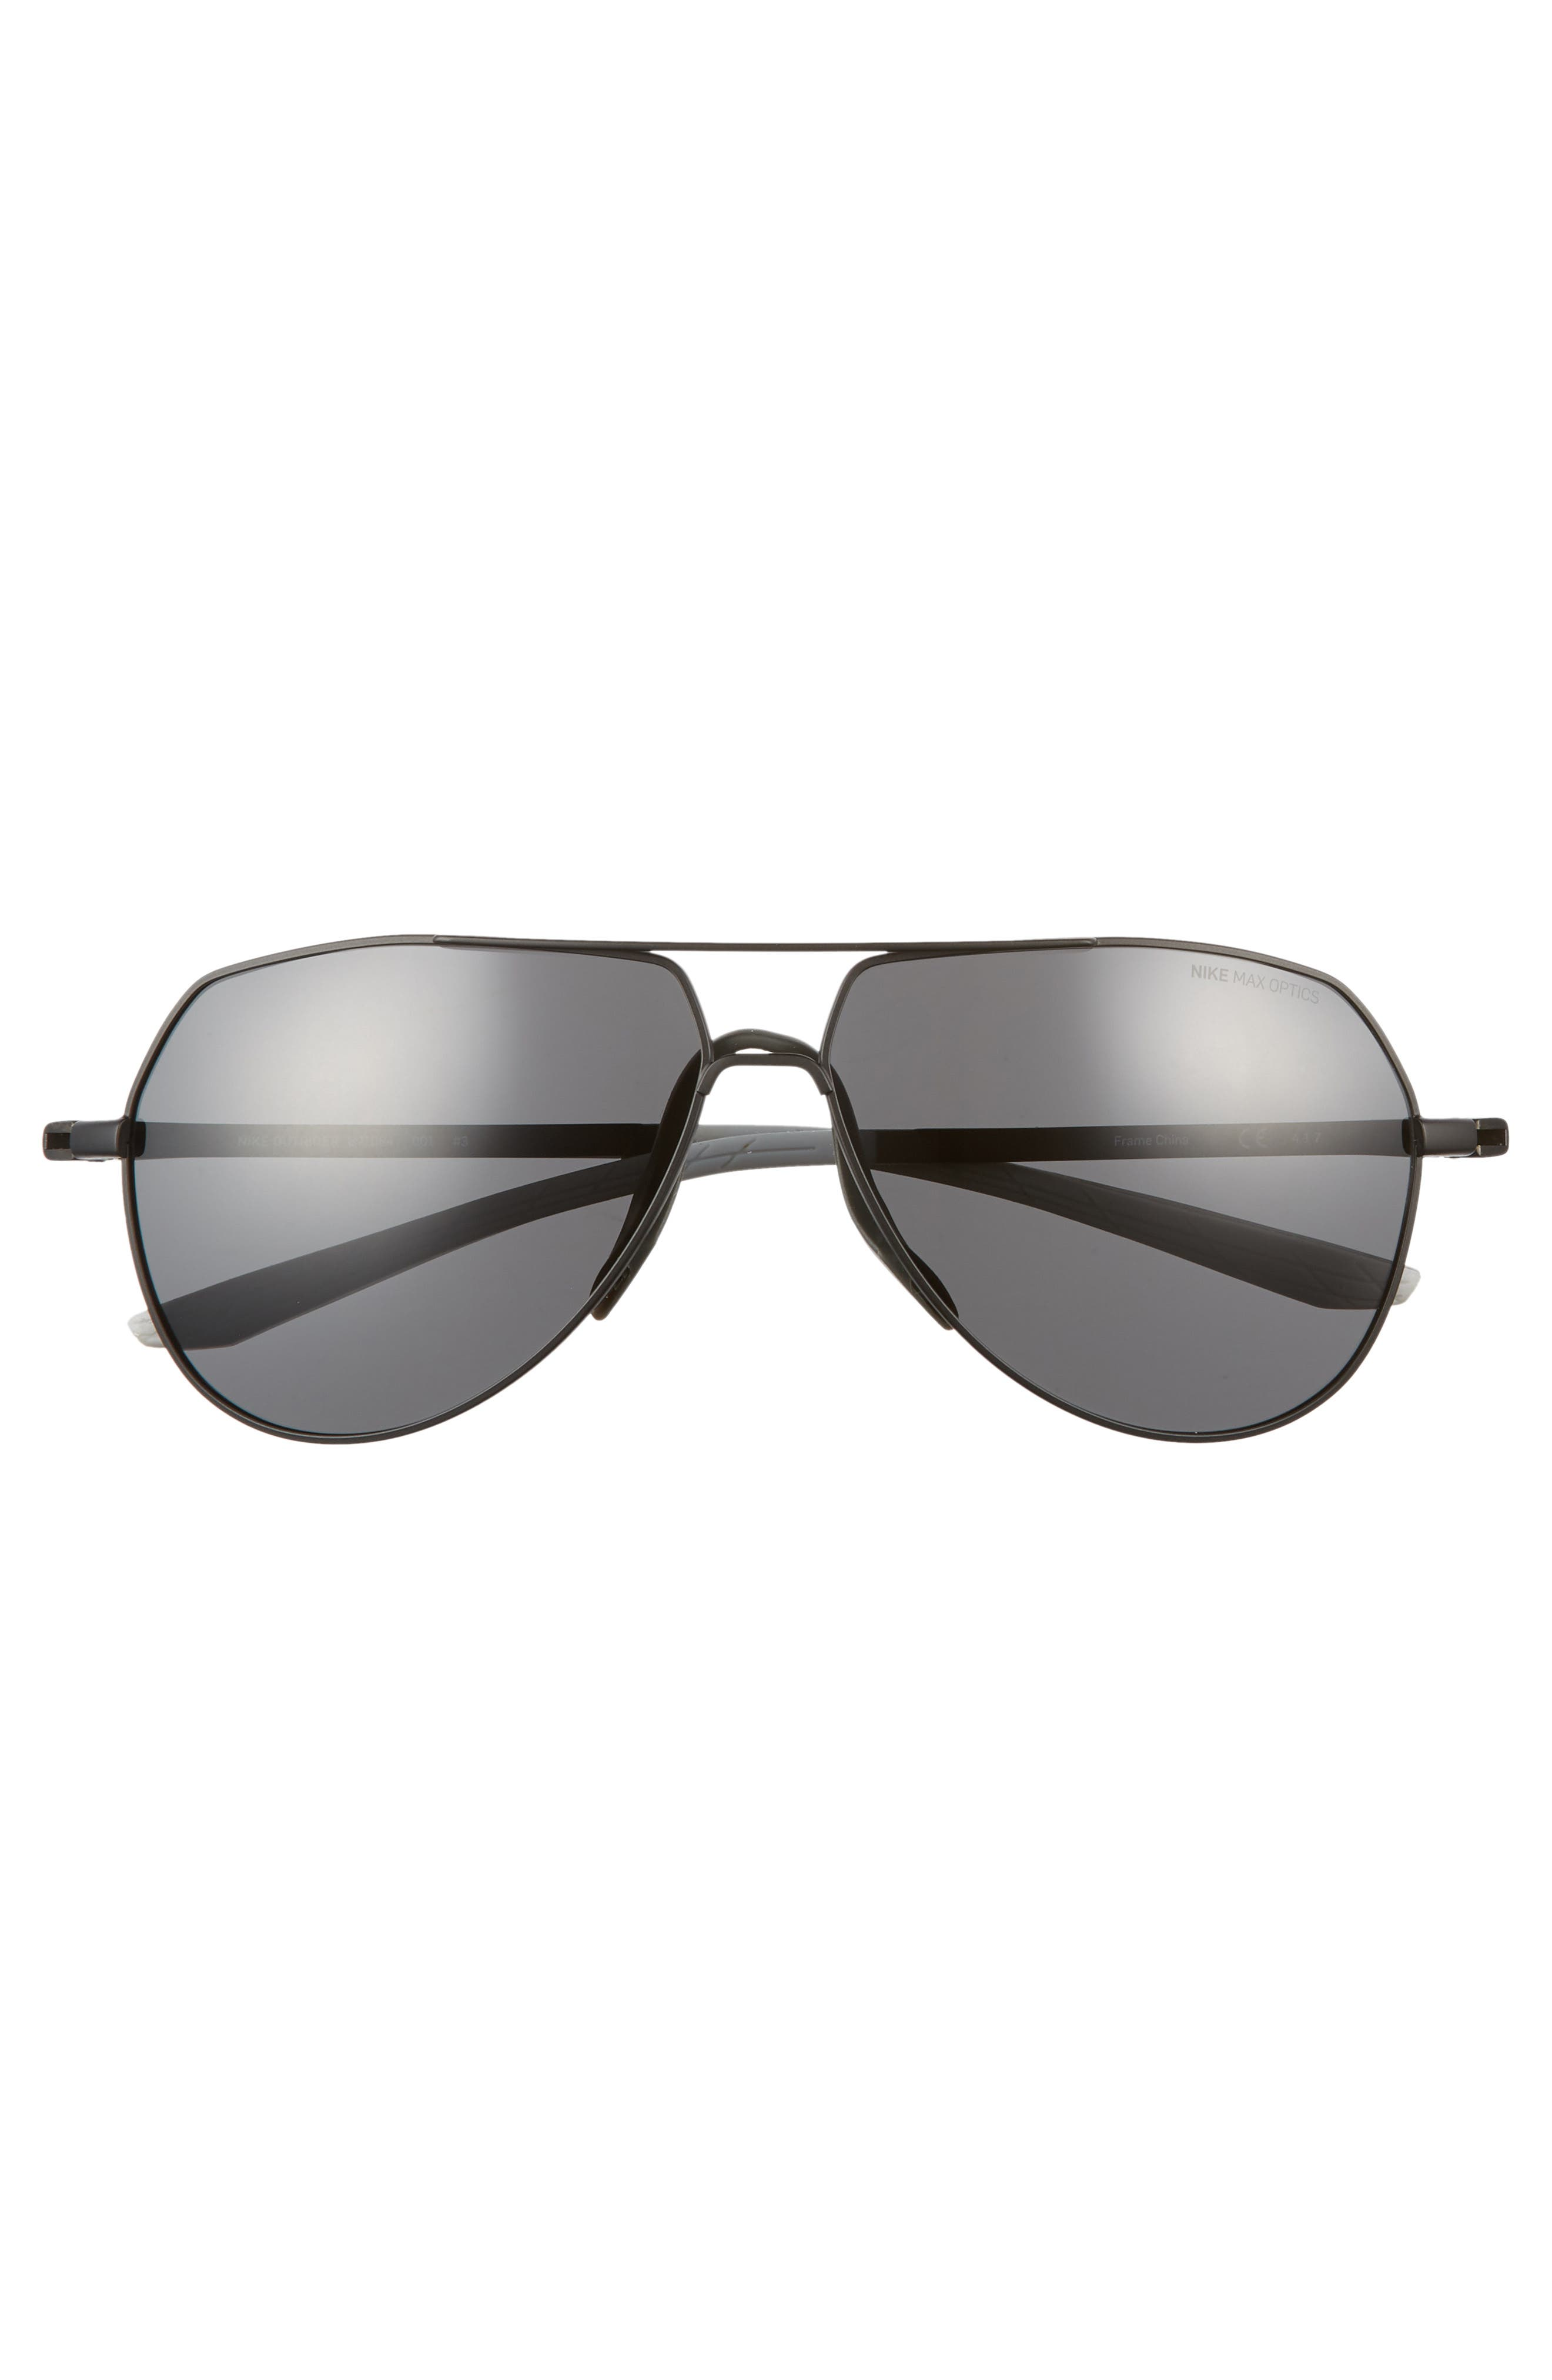 Outrider 62mm Oversize Aviator Sunglasses,                             Alternate thumbnail 2, color,                             Black/ Grey